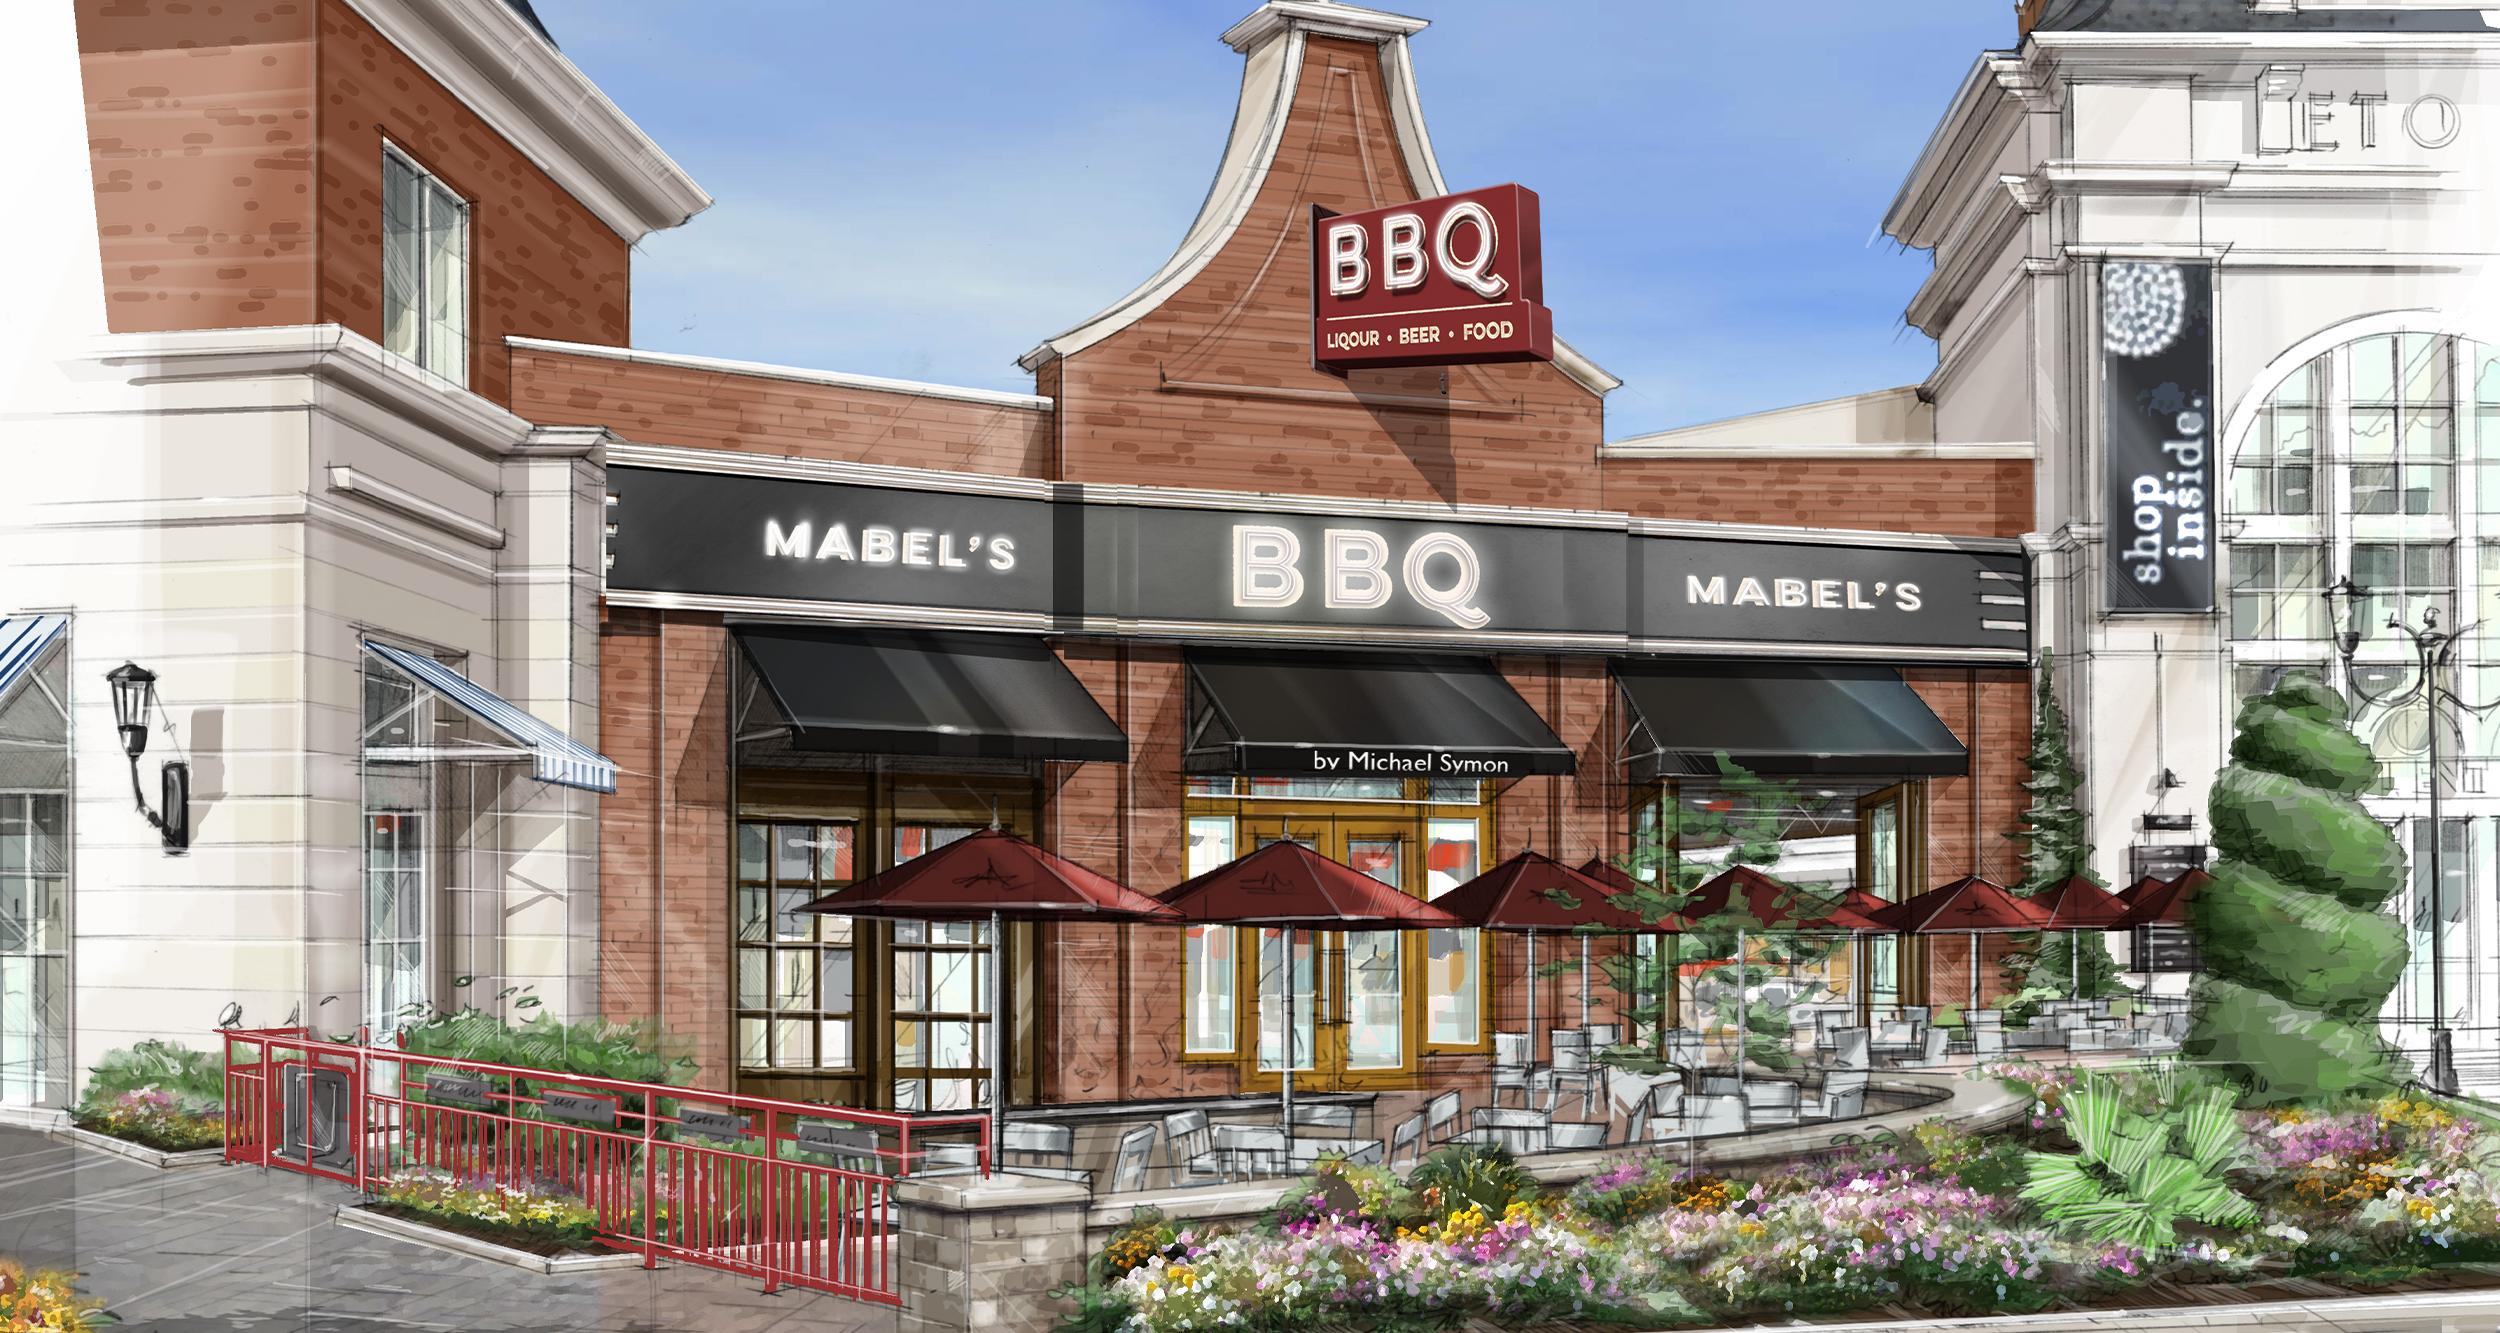 Mabel's BBQ